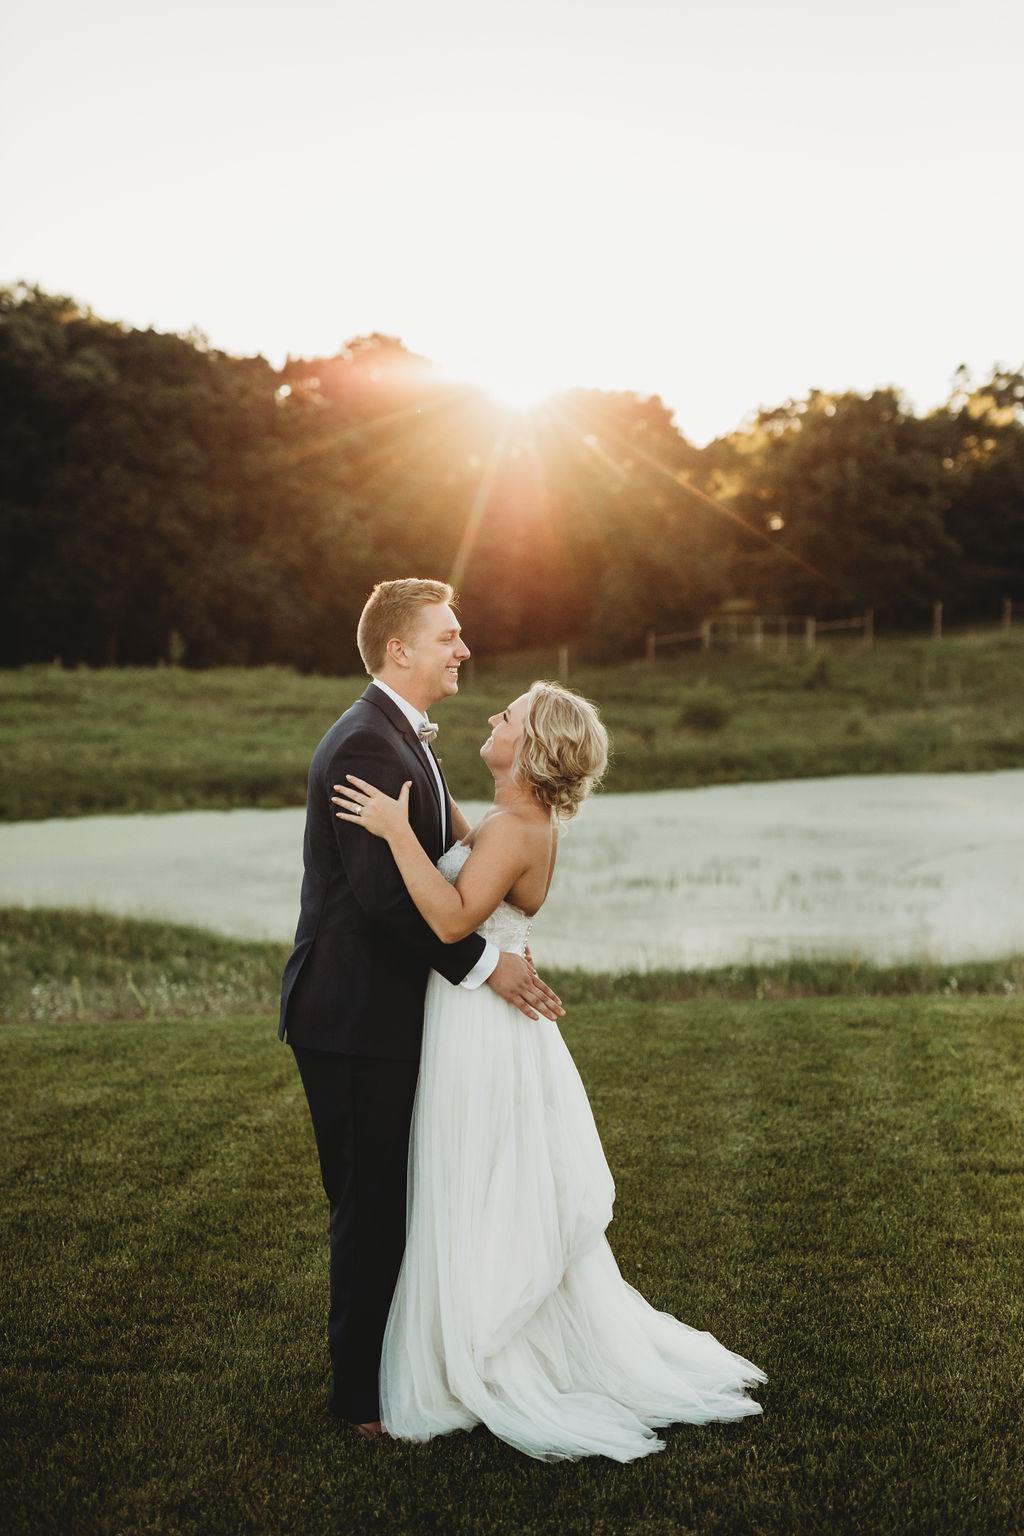 engle-olson-katie-dalton-wedding-clewell-photography-11.jpg